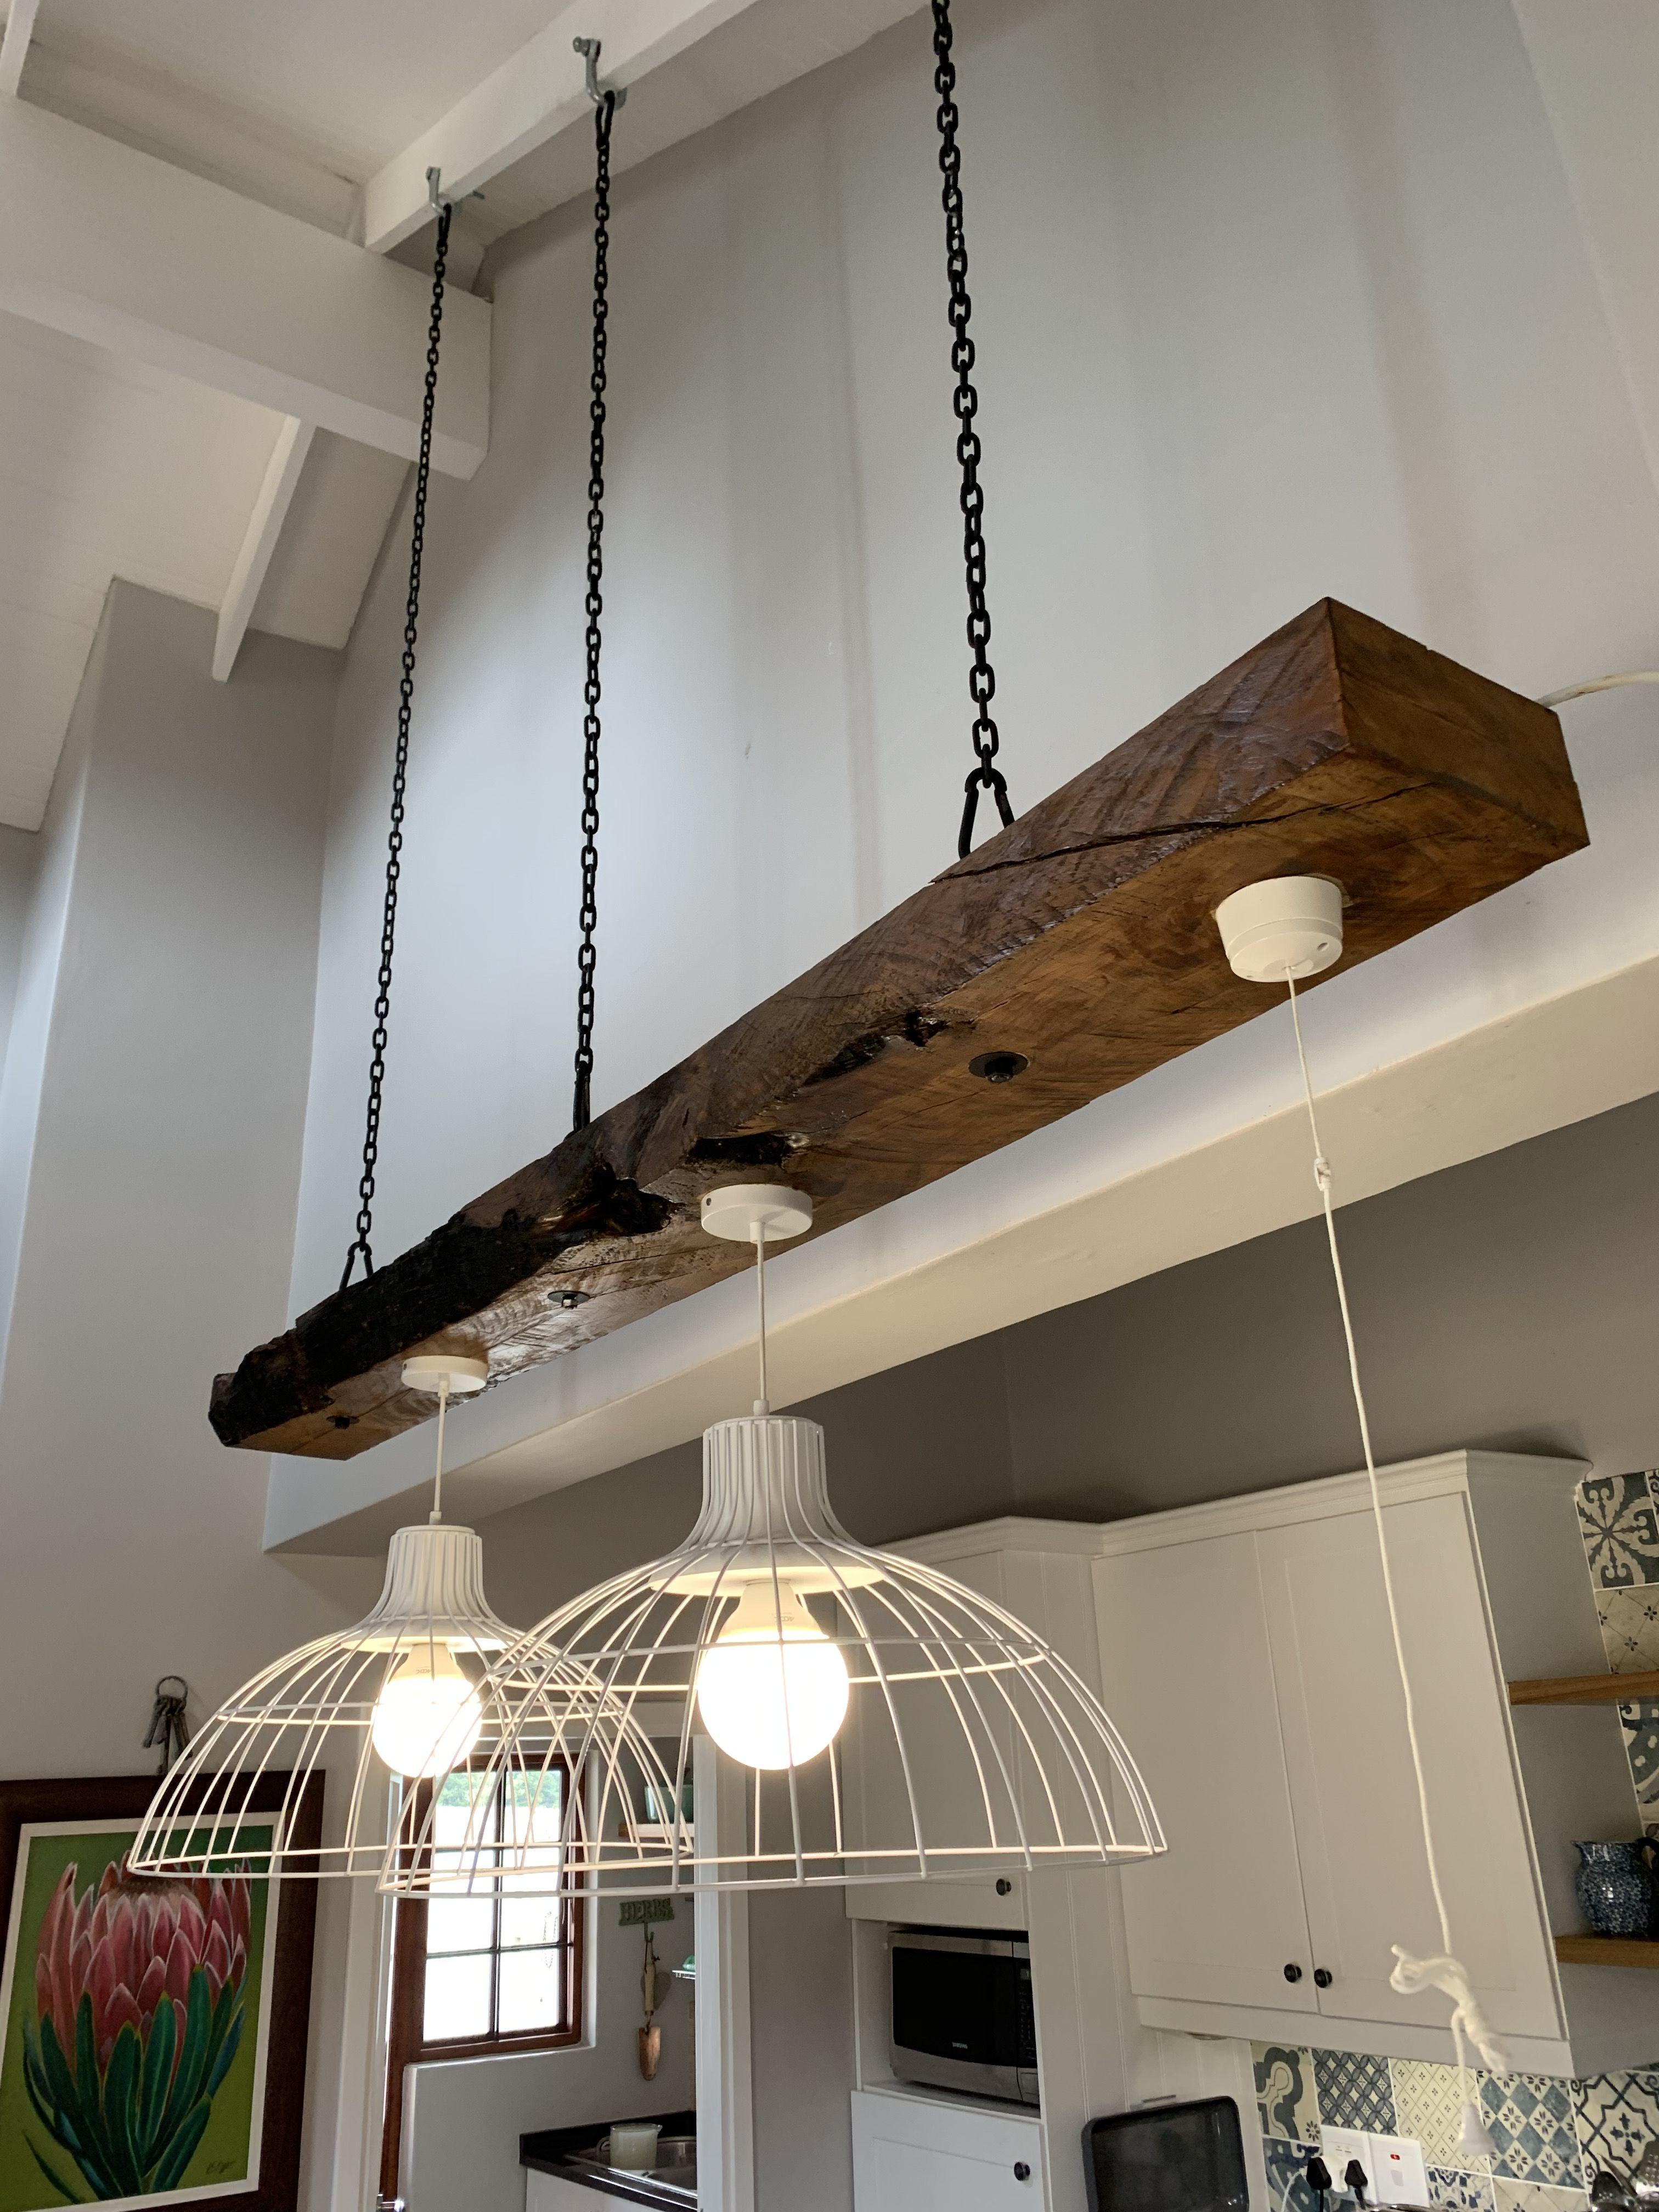 Sleeper Feature Light Fitting Light Fittings Ceiling Lights Feature Light